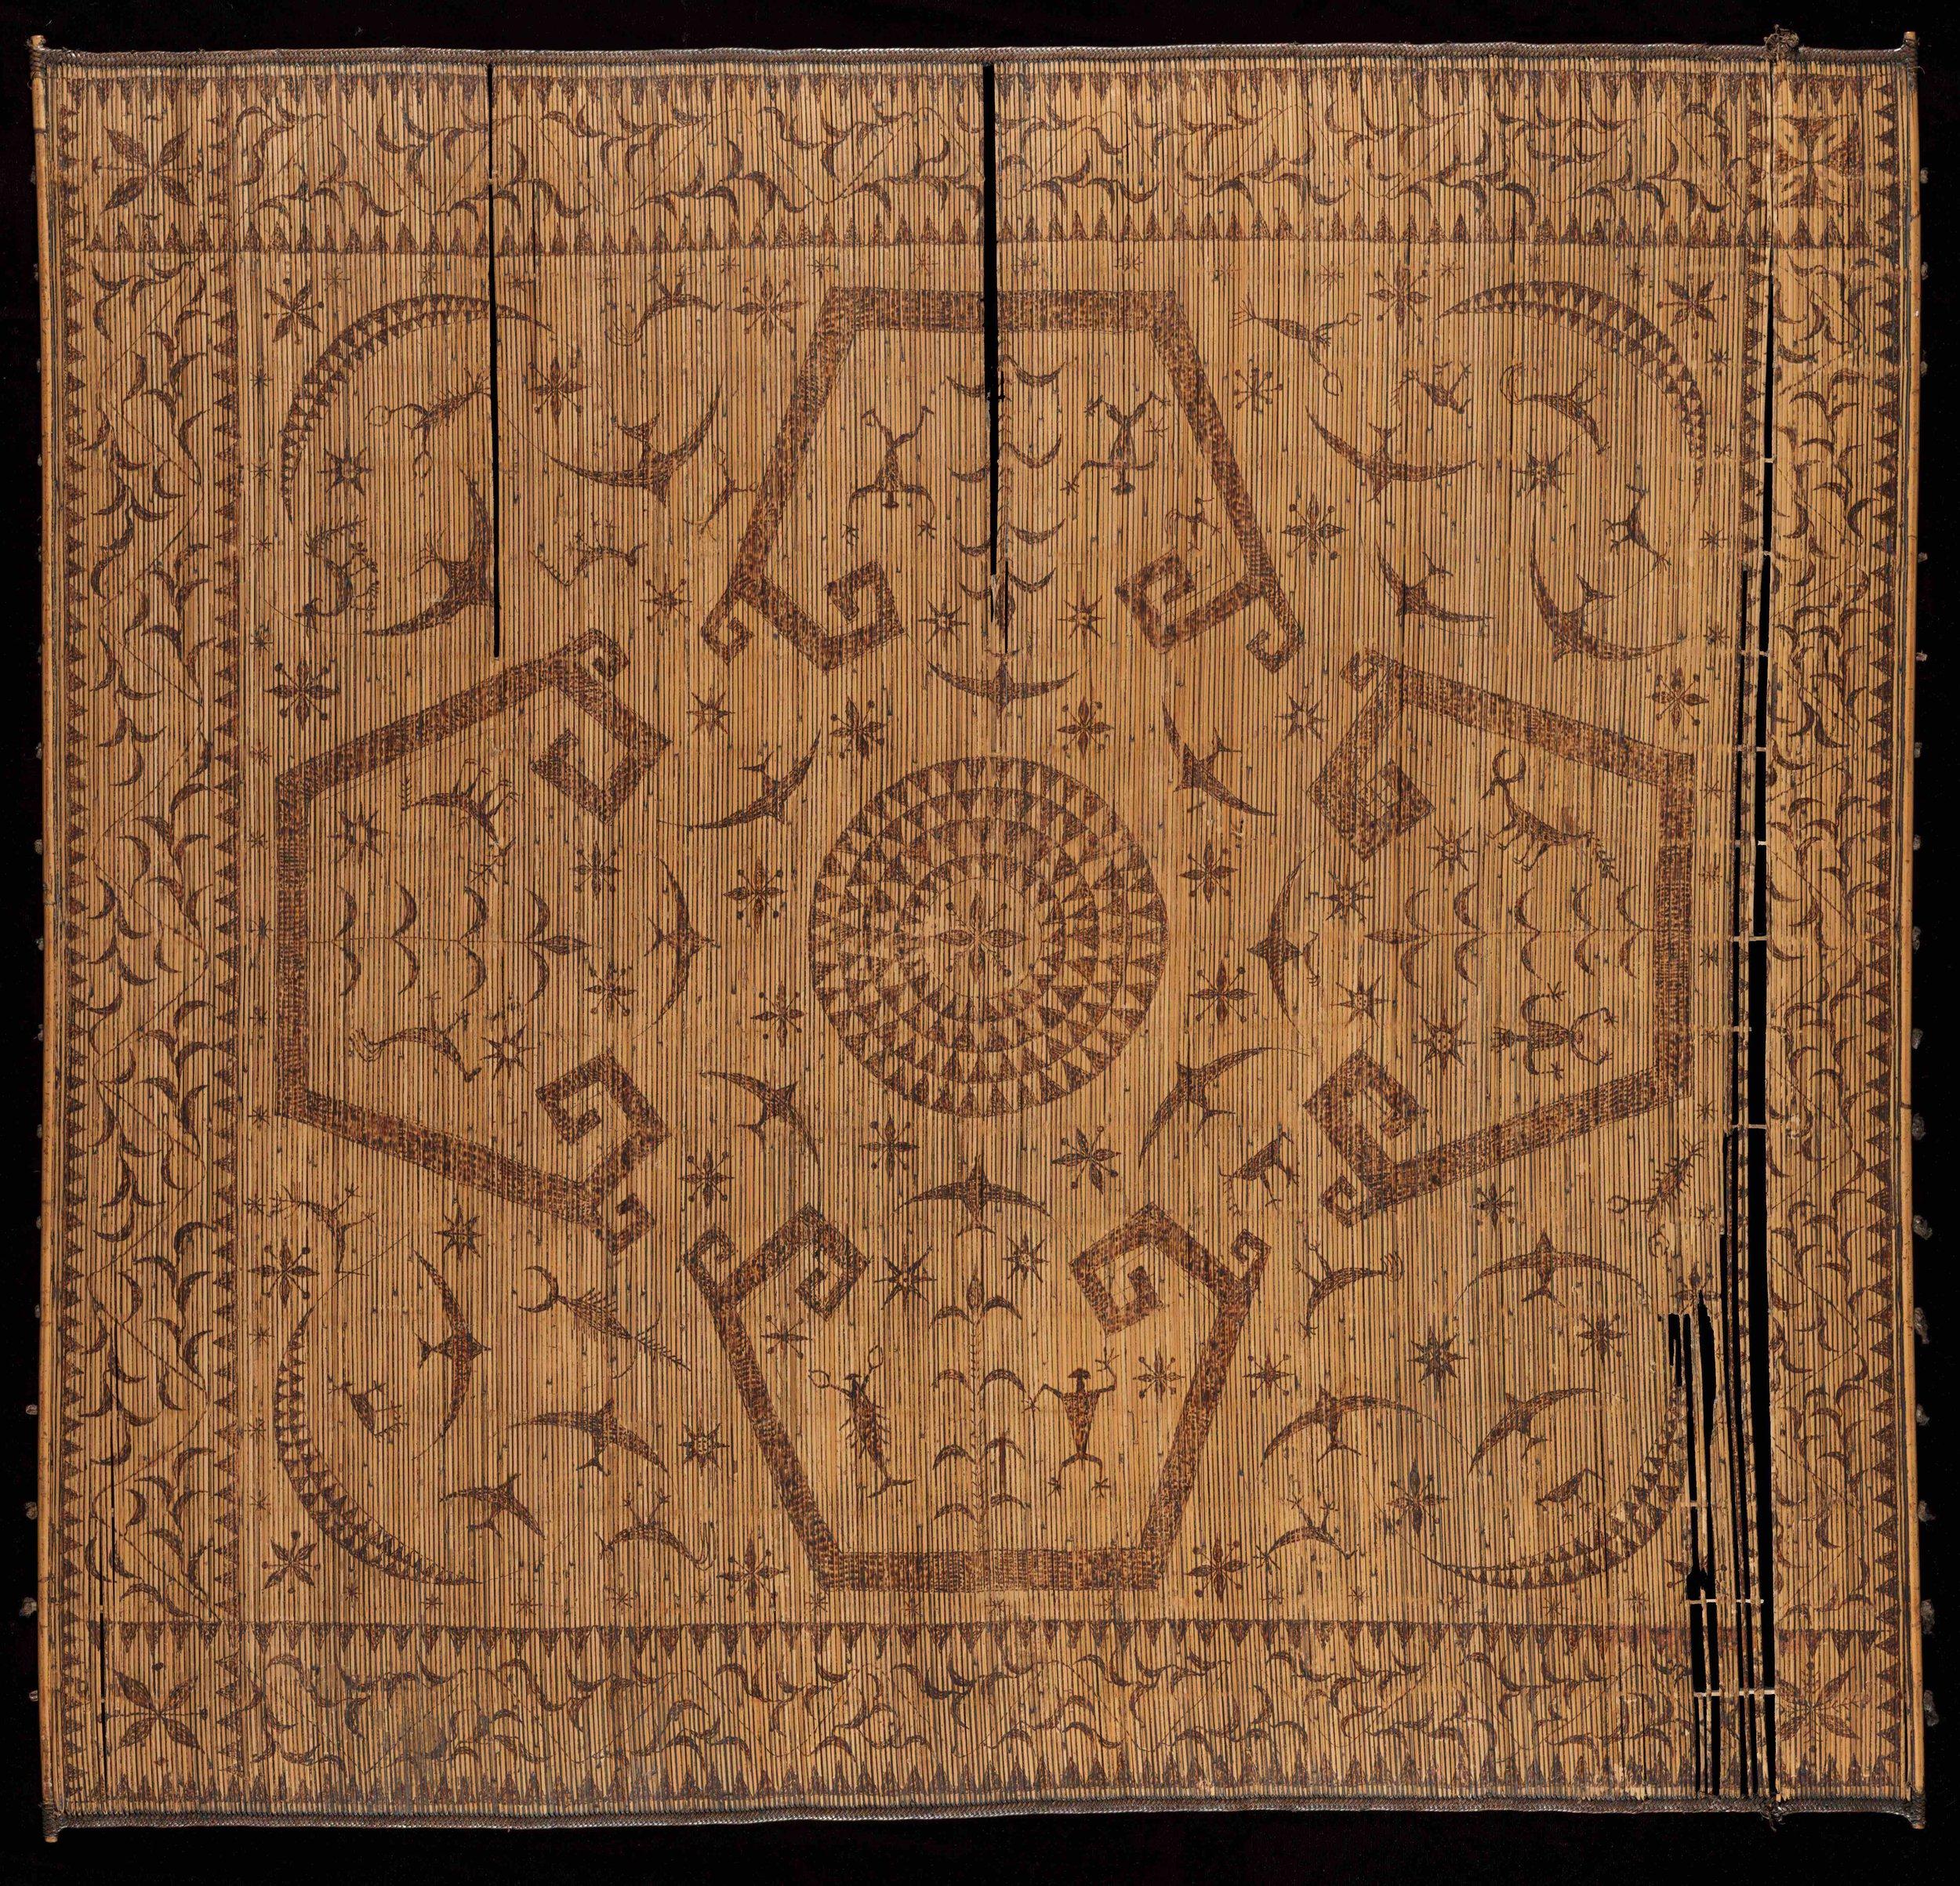 Ceremonial Split Rattan Mat |  Lampit  © The Dallas Museum of Art | Texas, USA